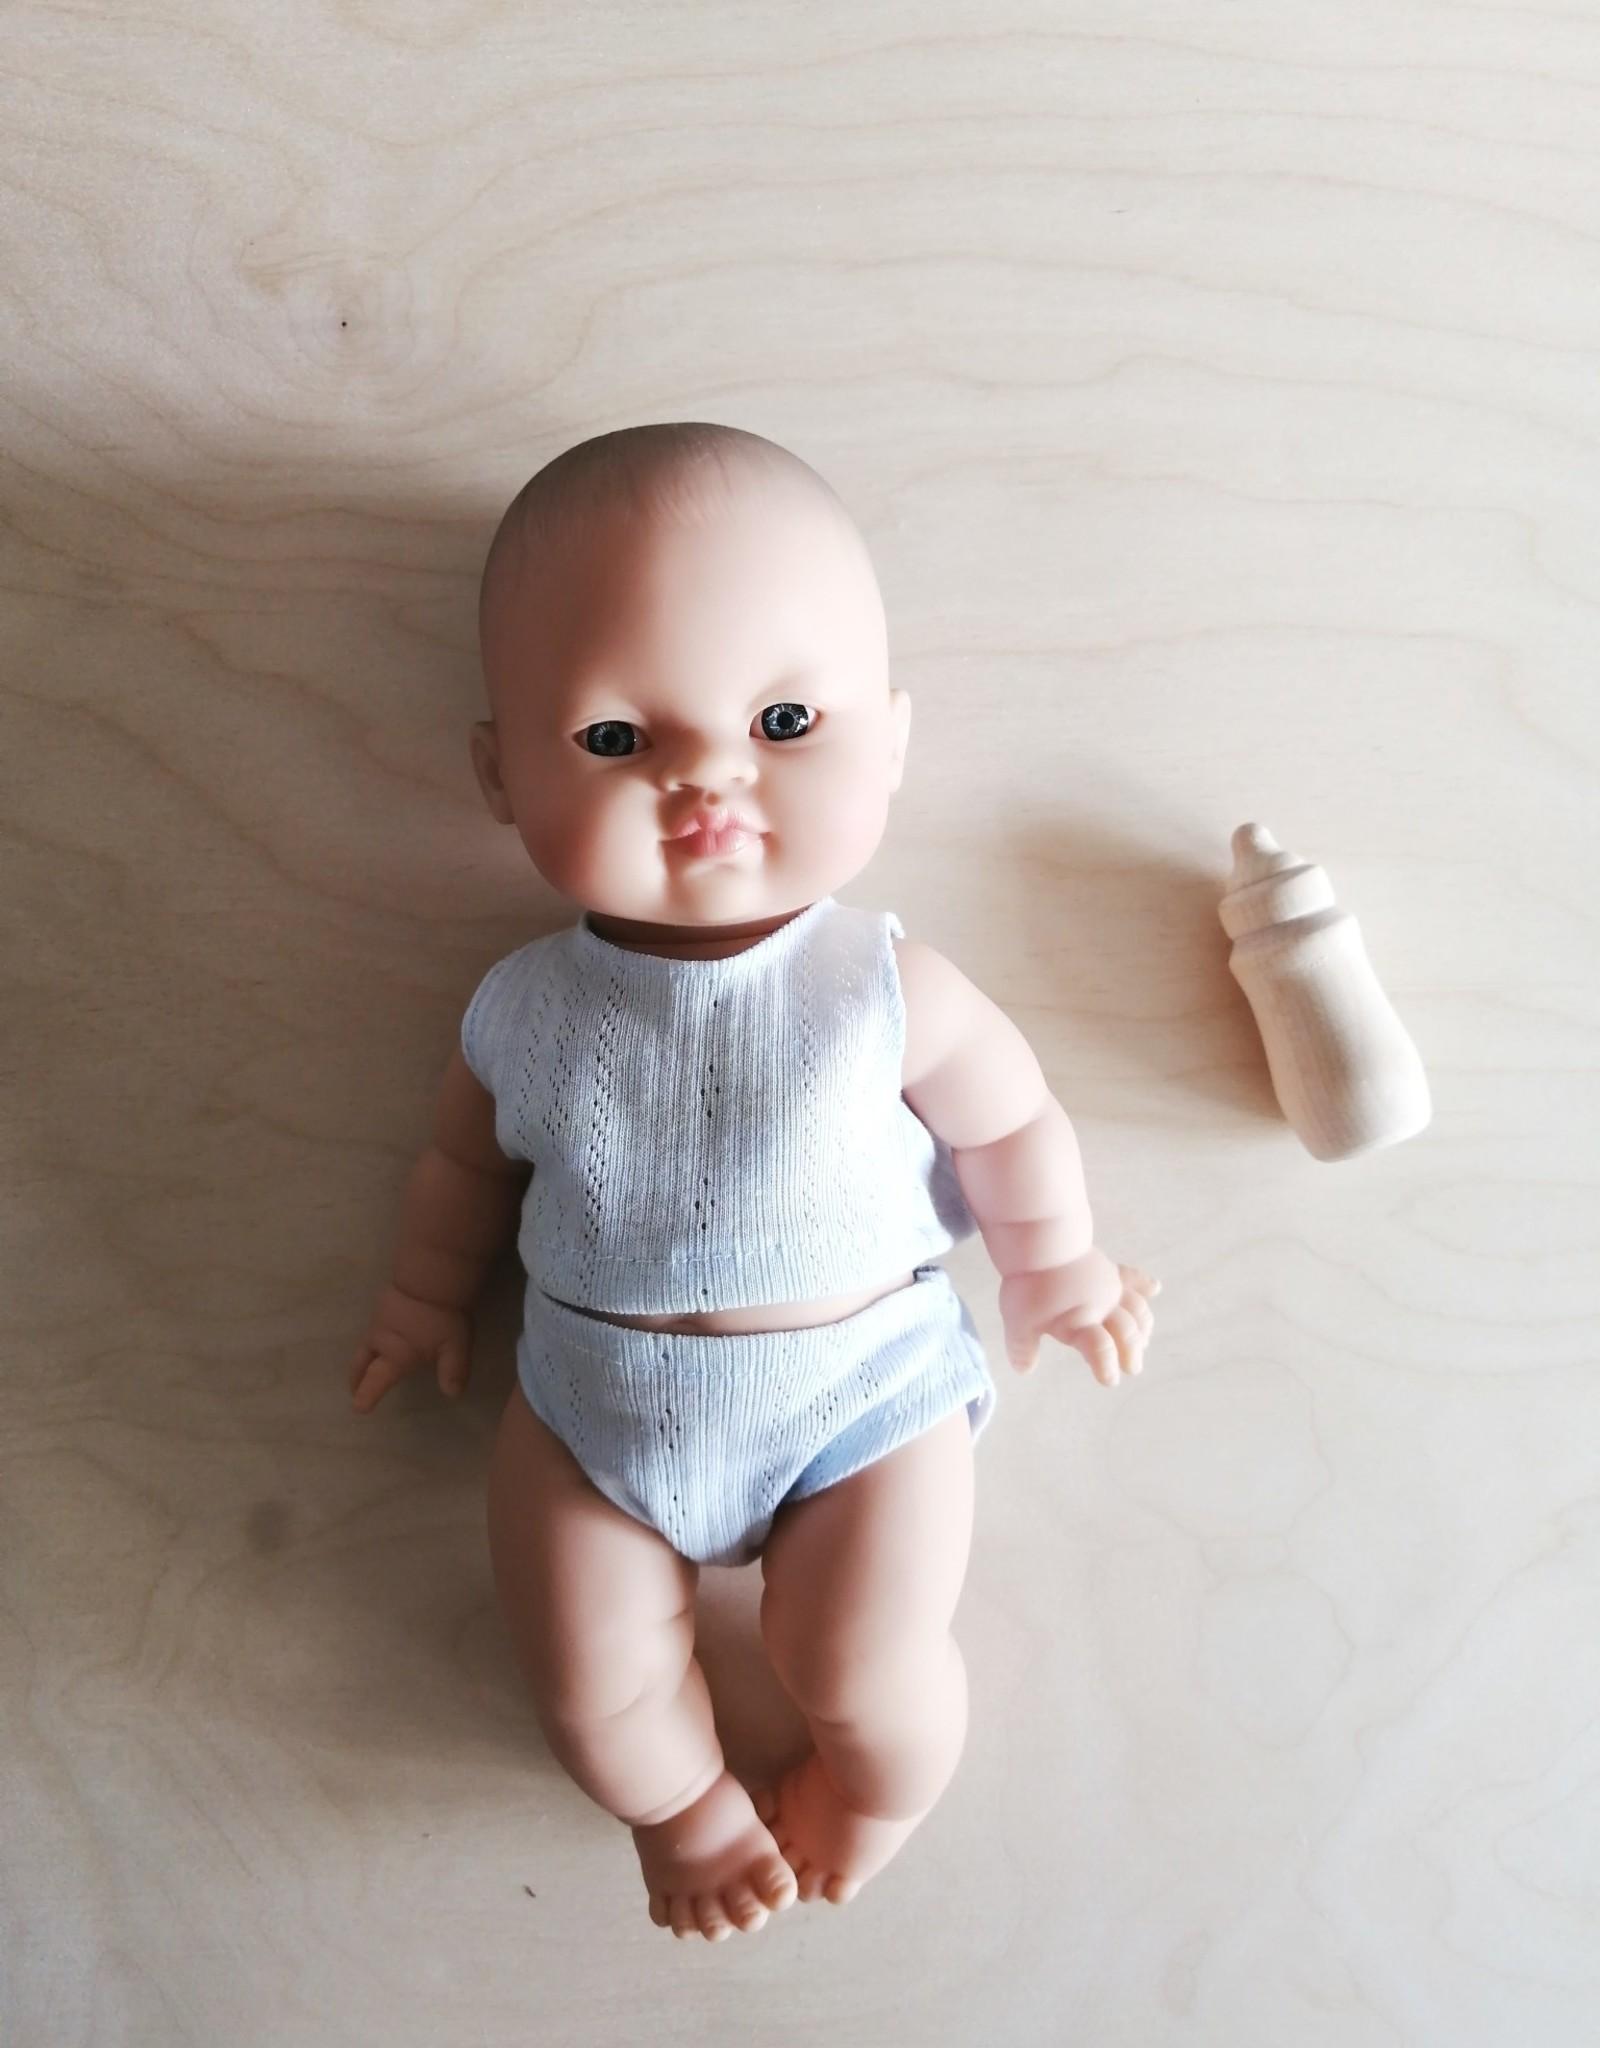 Veille sur toi Wooden doll bottle